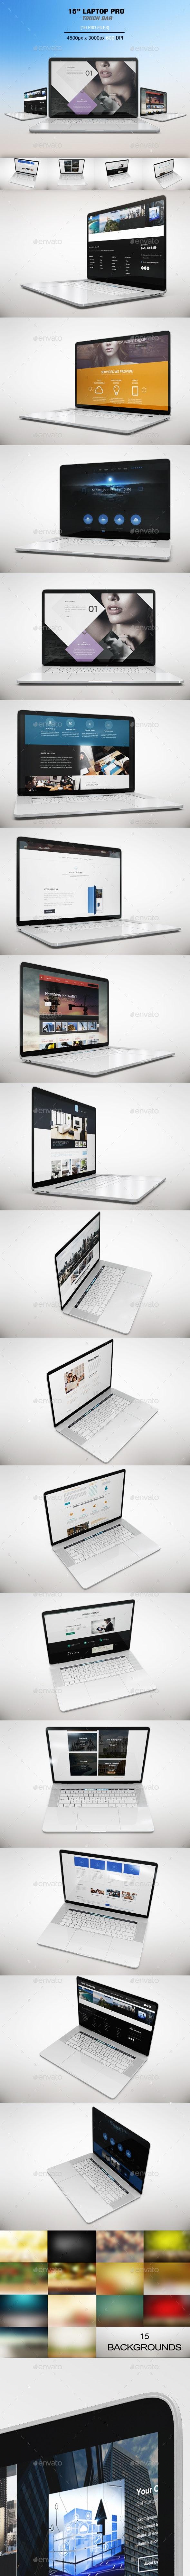 "15"" Laptop Pro Touch Bar Mockup - Laptop Displays"